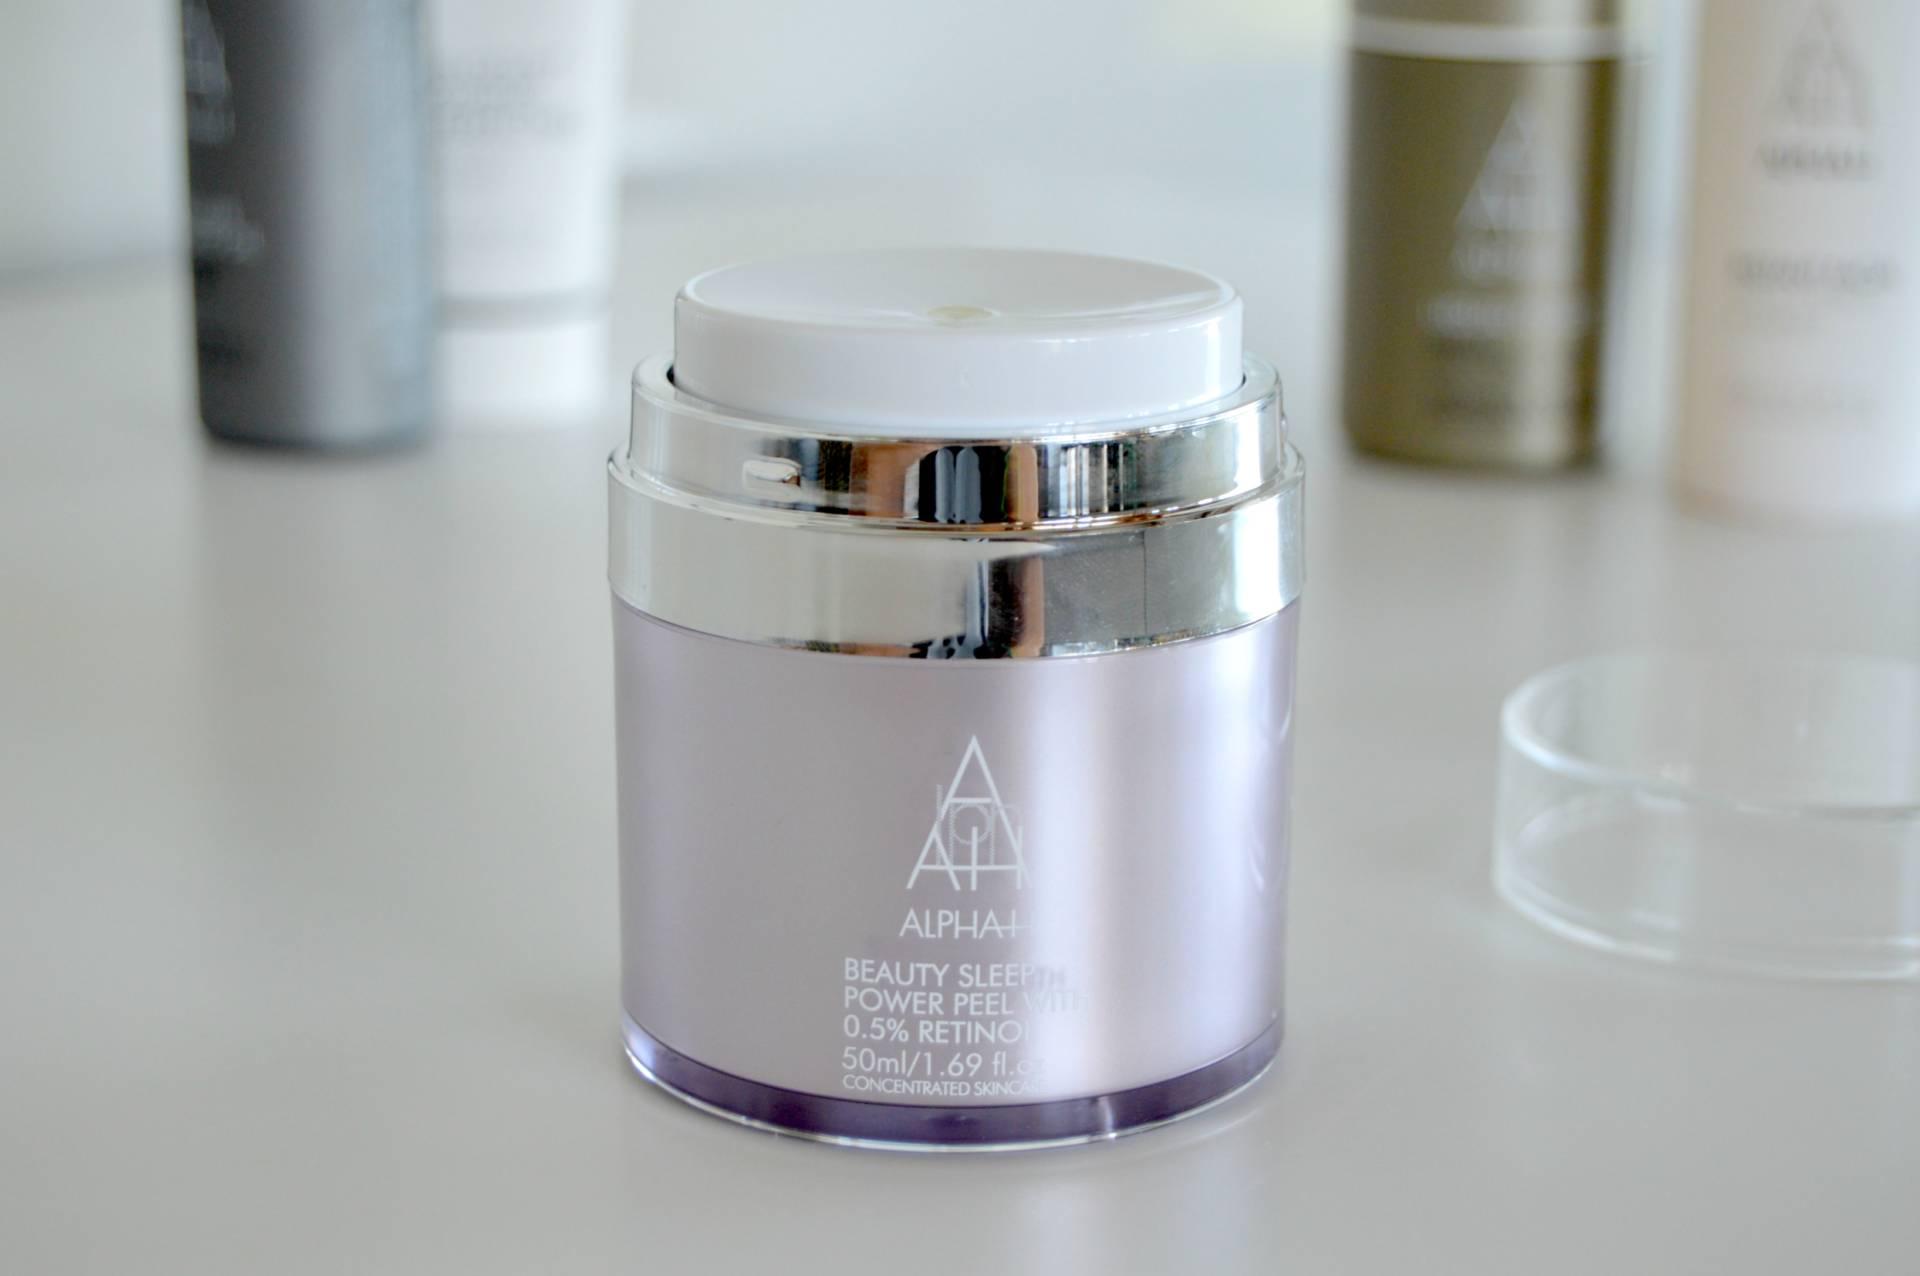 alpha h beauty sleep retinol power peel review inhautepursuit